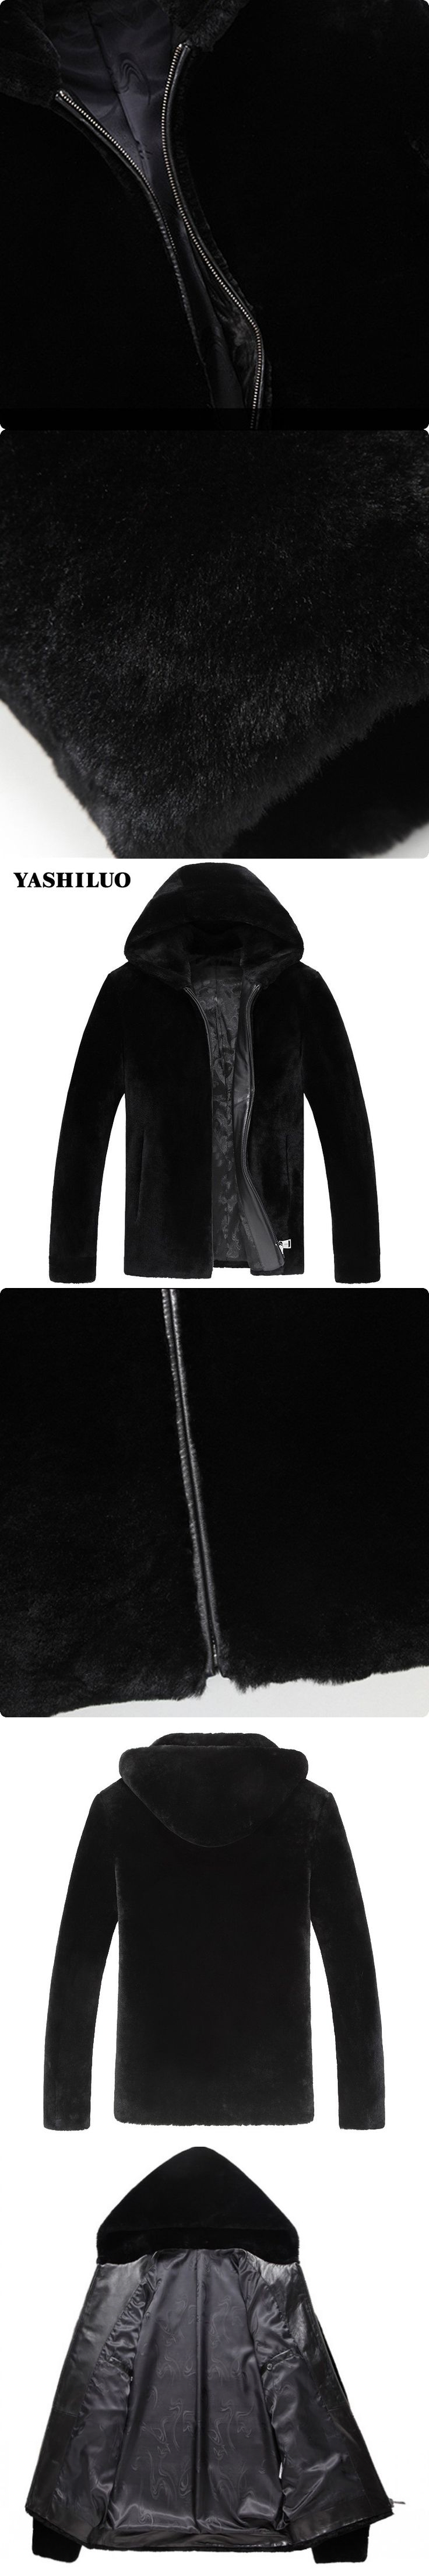 New Arrival Warm Sheepskin Genuine Leather Mens Jacket With Hooded Coat For Male Fashion Chaquetas De Cuero Hombre Blouson Moto